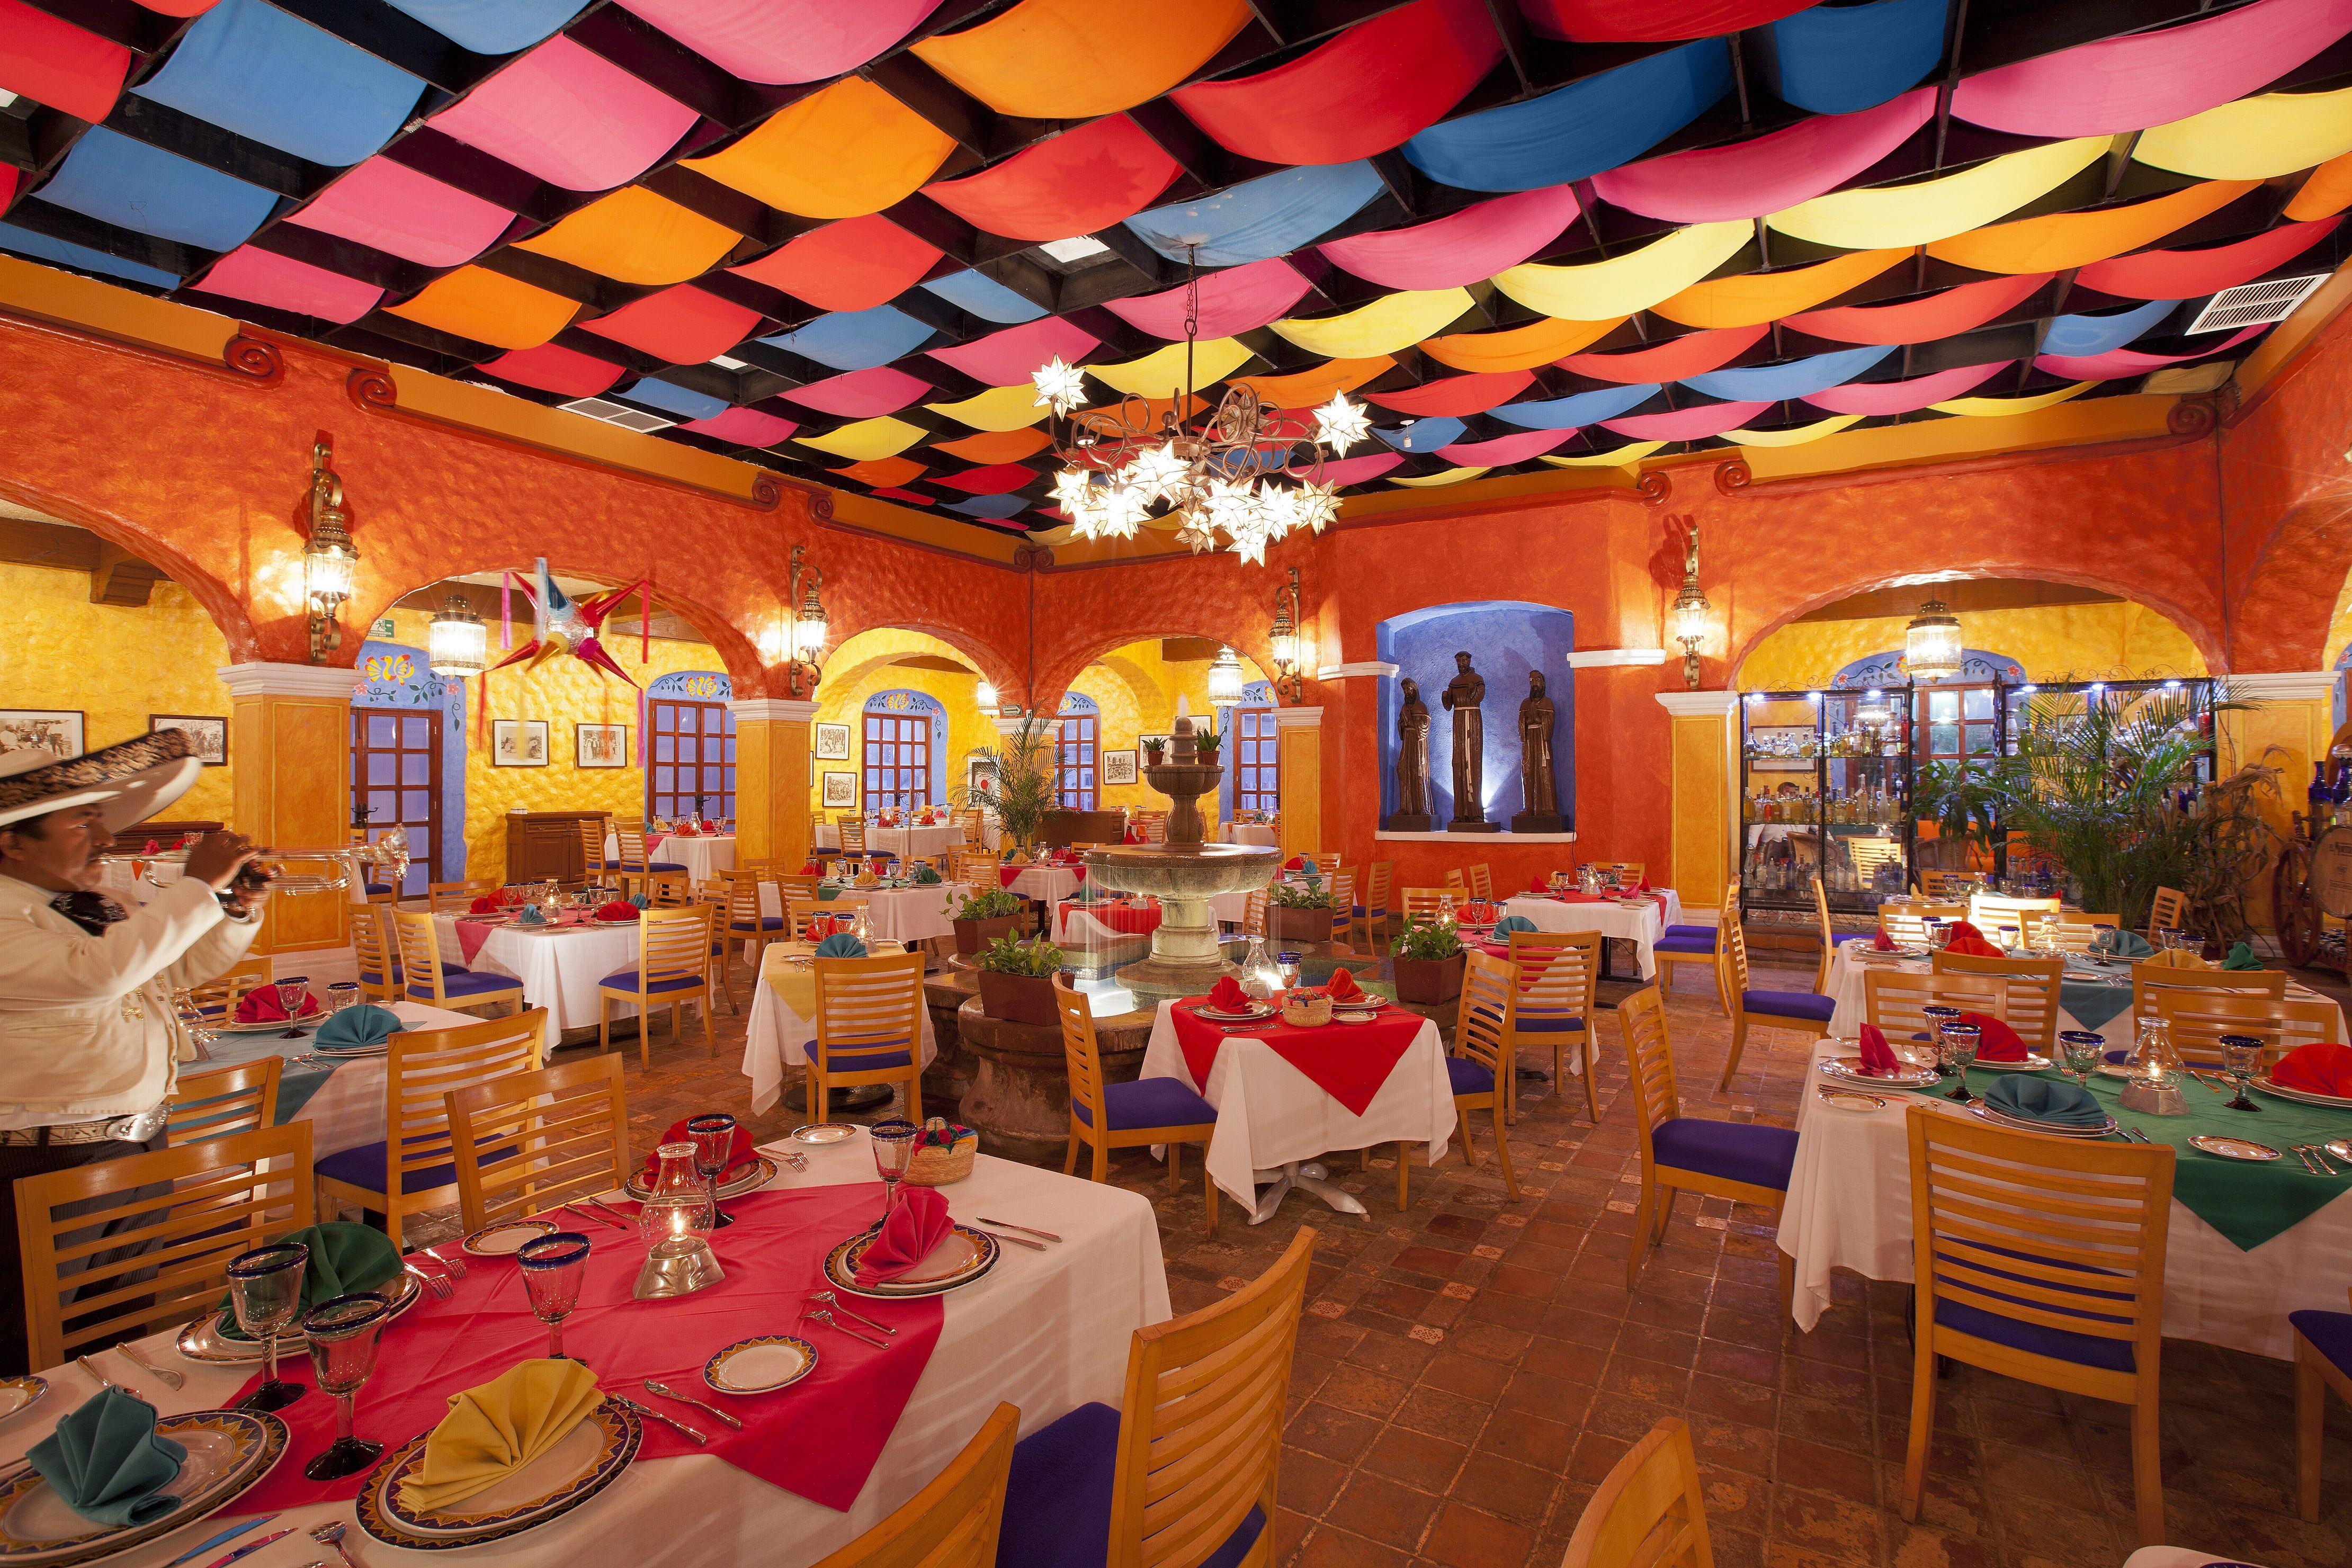 Mexican Restaurant Mexican Restaurant Decor Mexican Restaurant Design Mexican Restaurants Interior